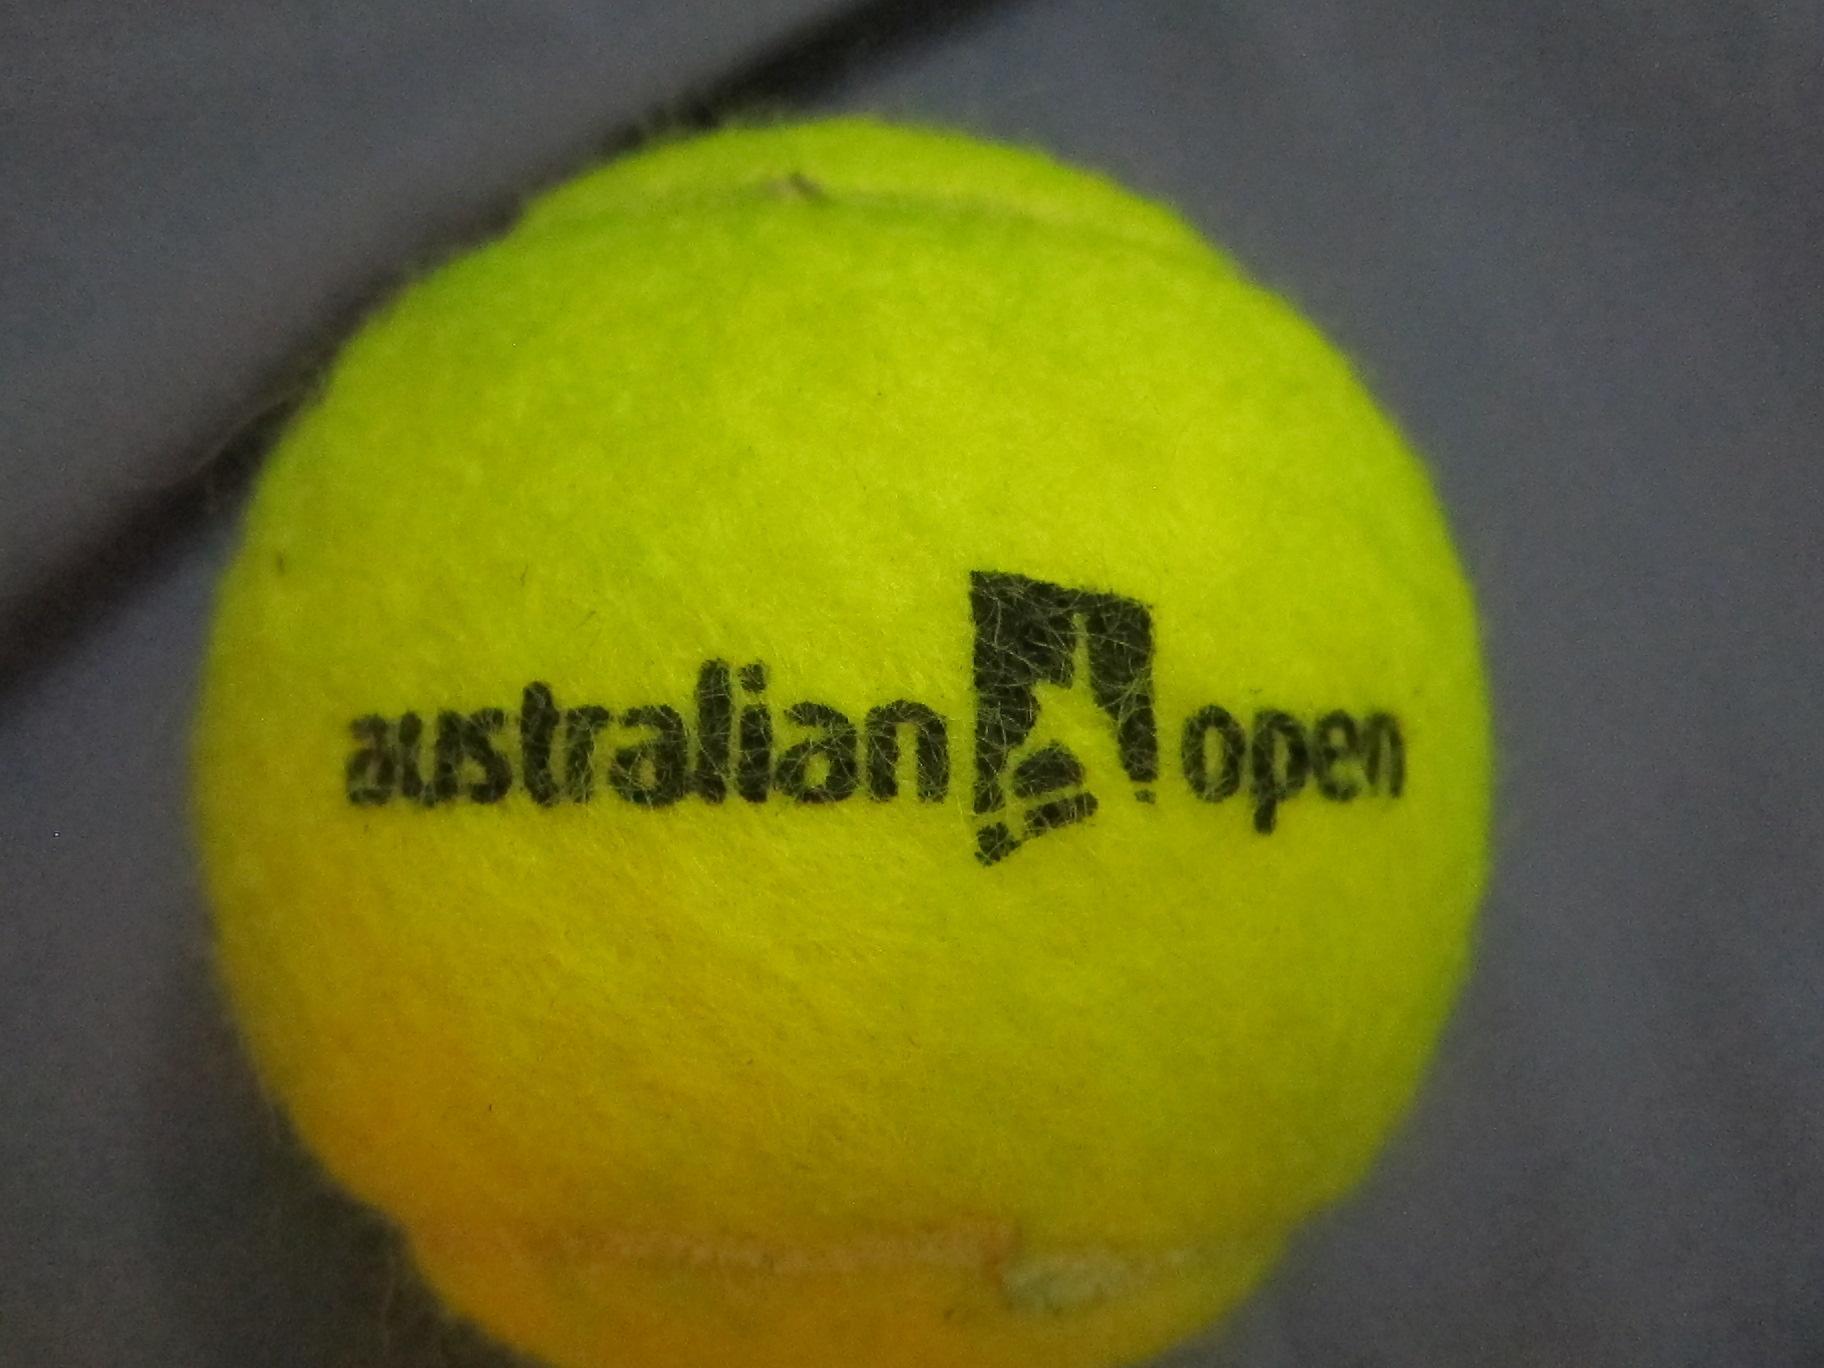 File:2013 Australian Open IMG 3919 (8395653225) jpg - Wikimedia Commons